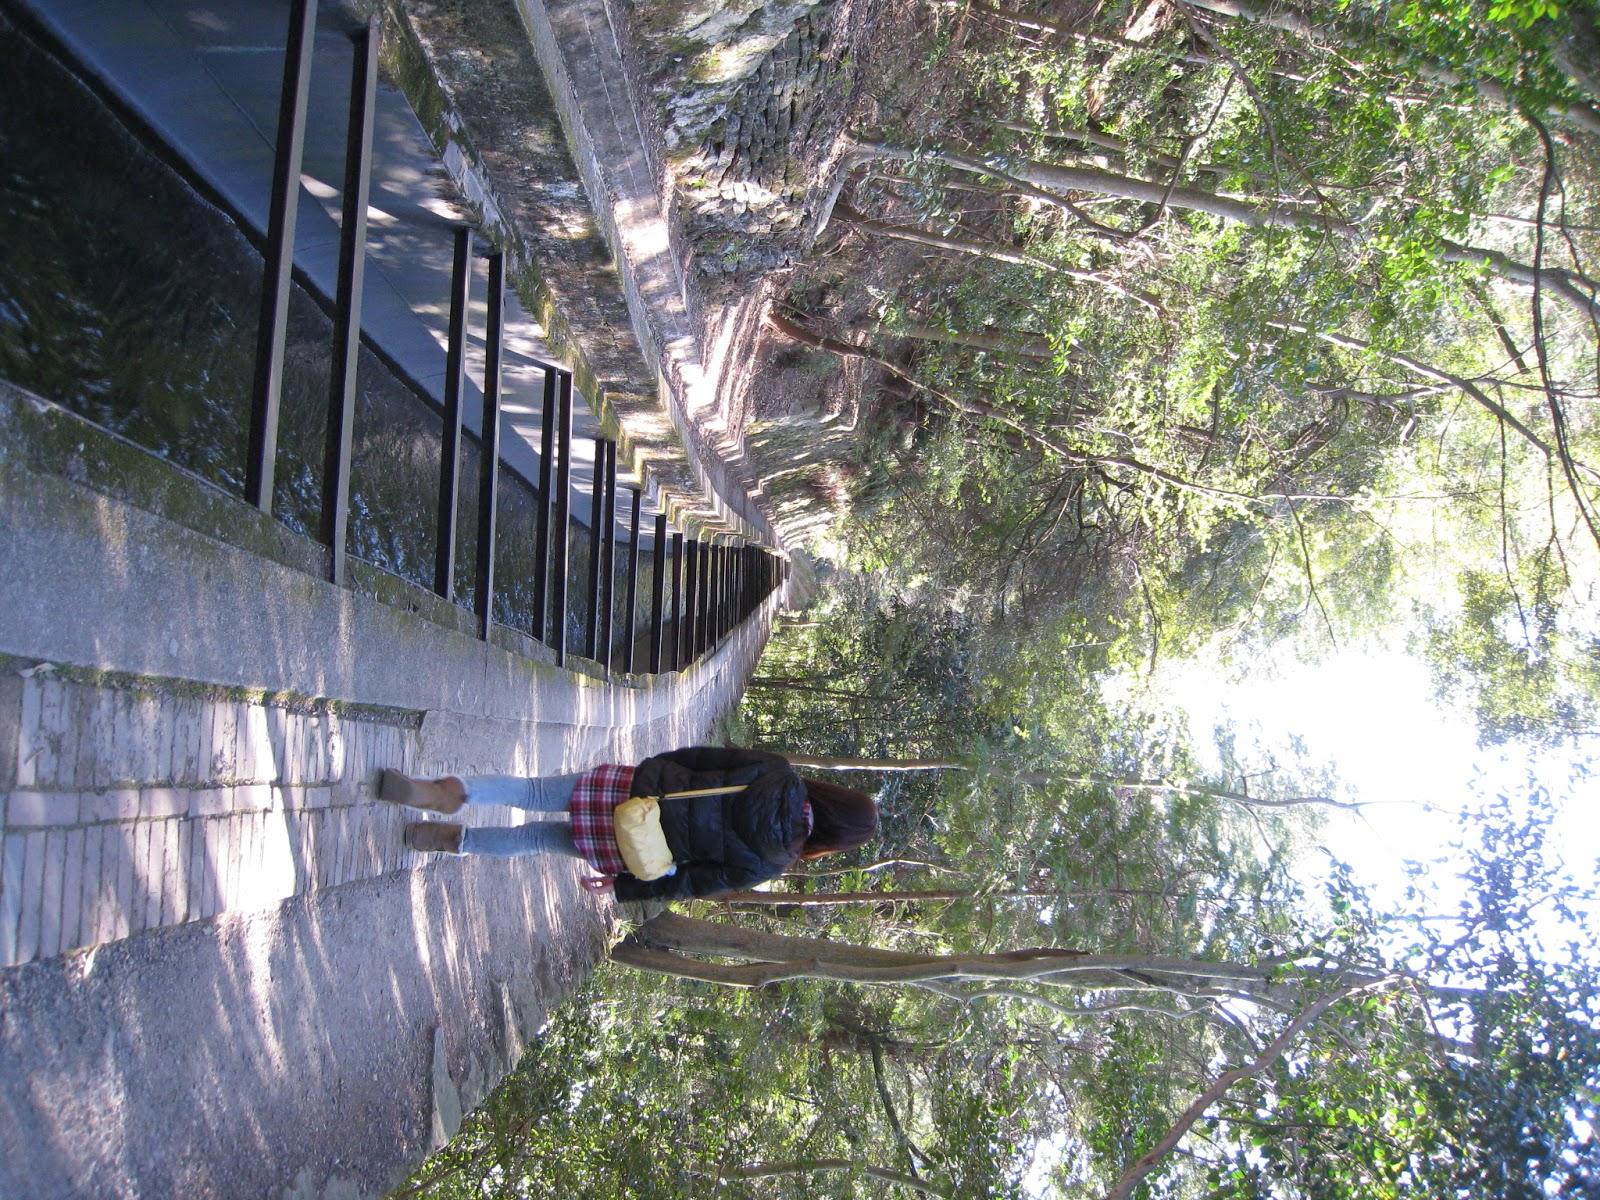 duhas blog: [京阪賞櫻] Day1-2. Kyoto 京都- 銀閣寺。哲學之道。南禪寺。蹴上鐵道